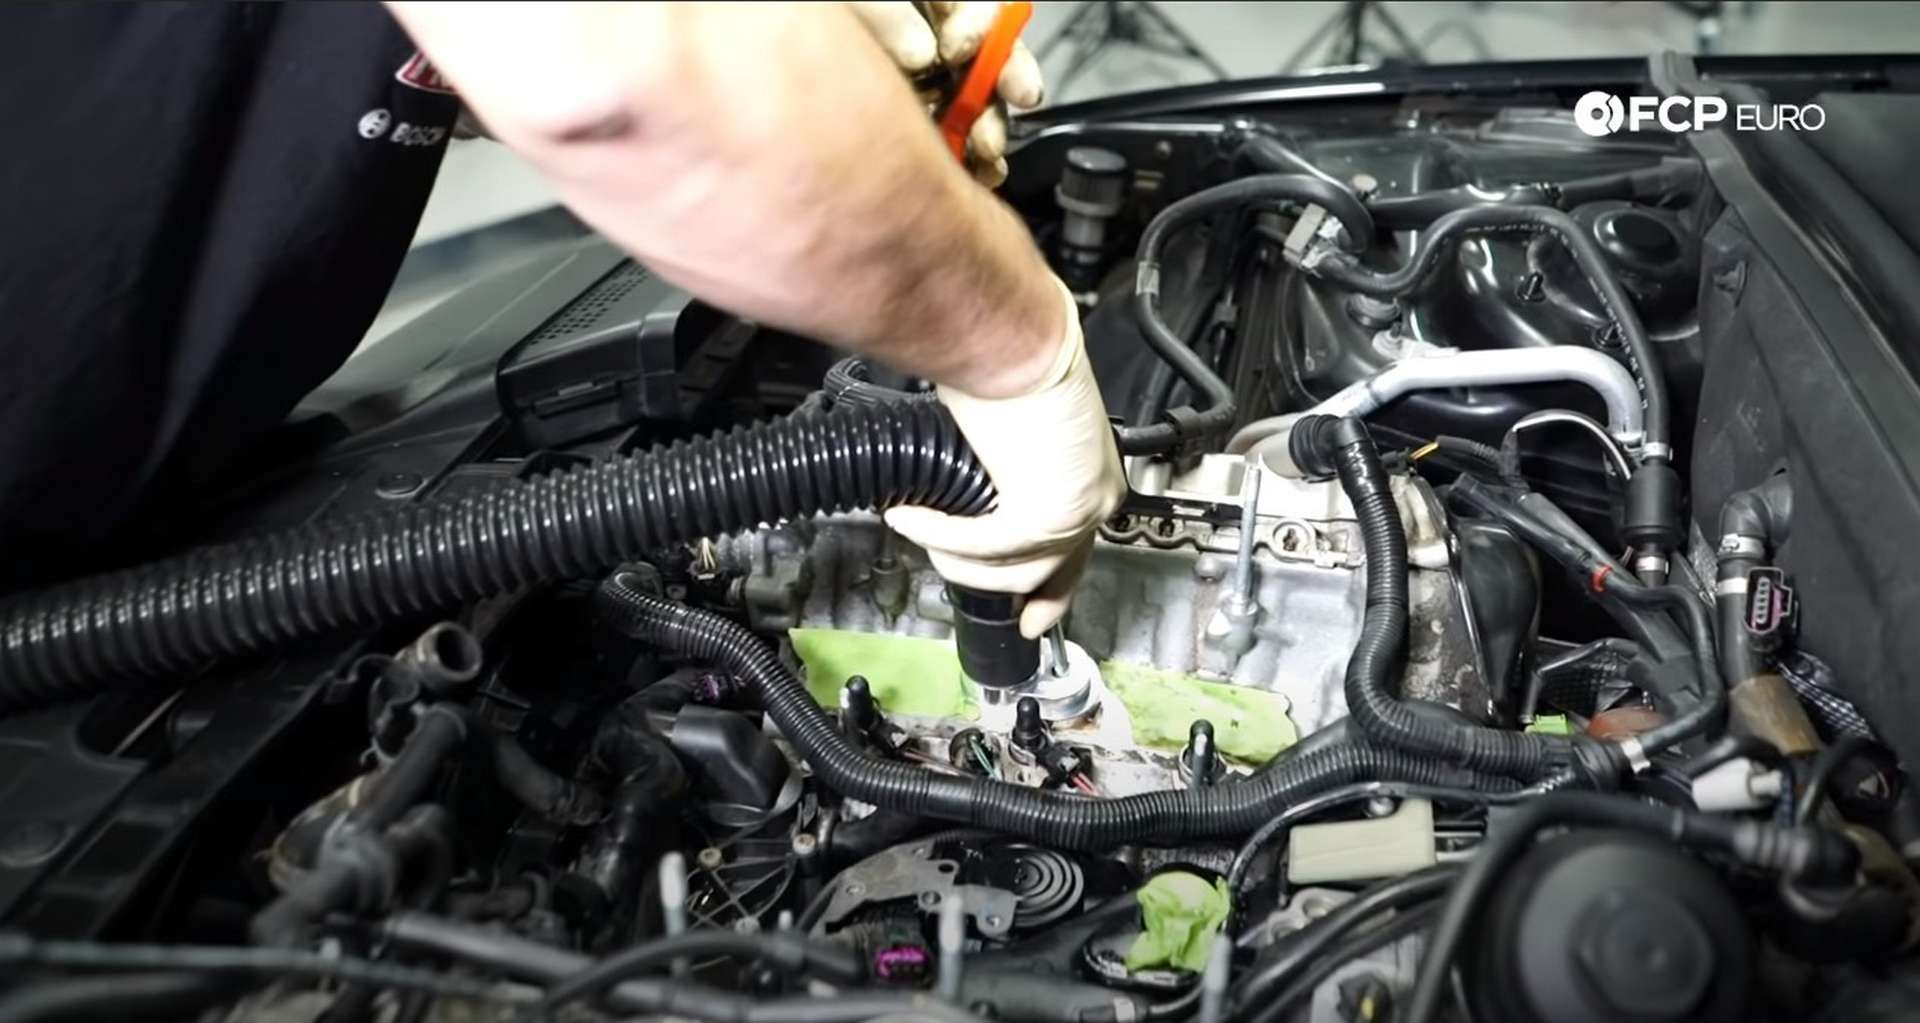 DIY Audi 3.0t Walnut Blasting Intake Valves cleaning the intake port